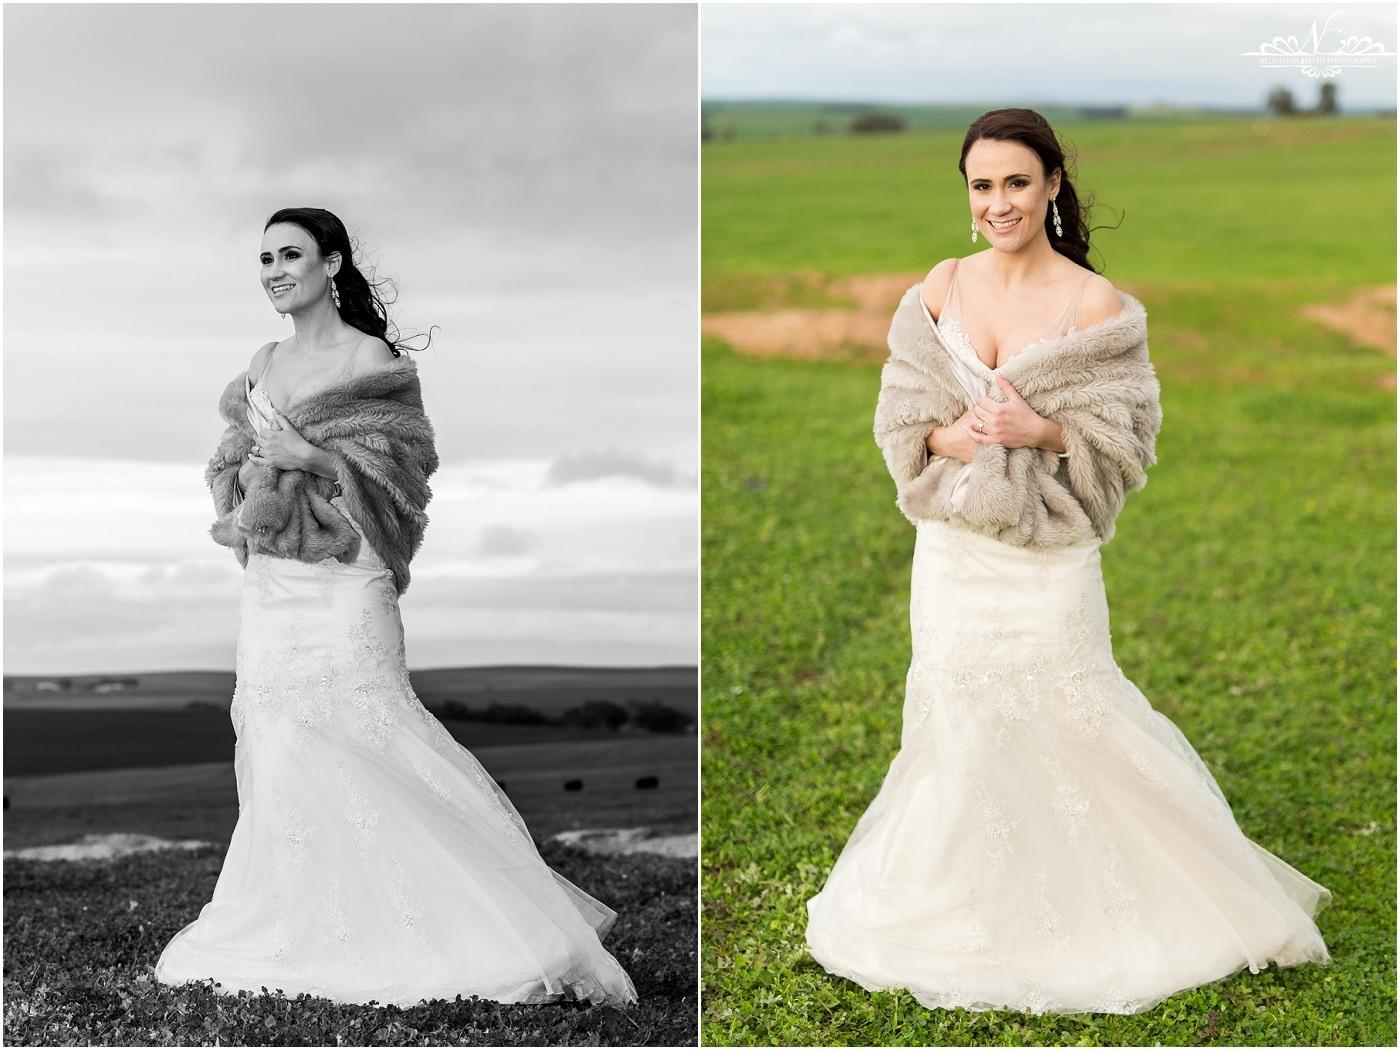 Eensgezind-Wedding-Photos-Nelis-Engelbrecht-Photography-108